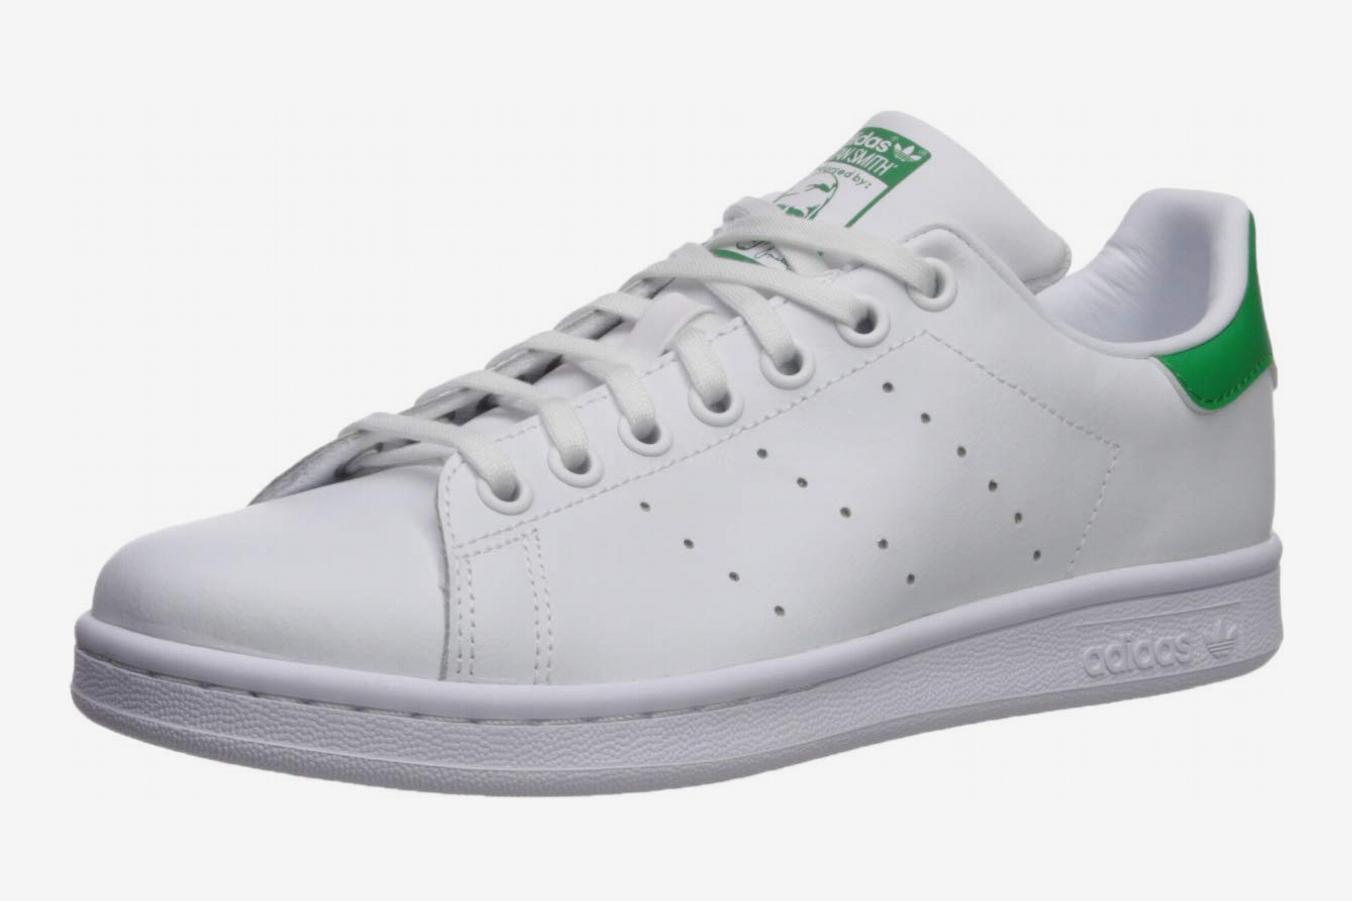 Adidas Kids Stan Smith Tennis Shoe